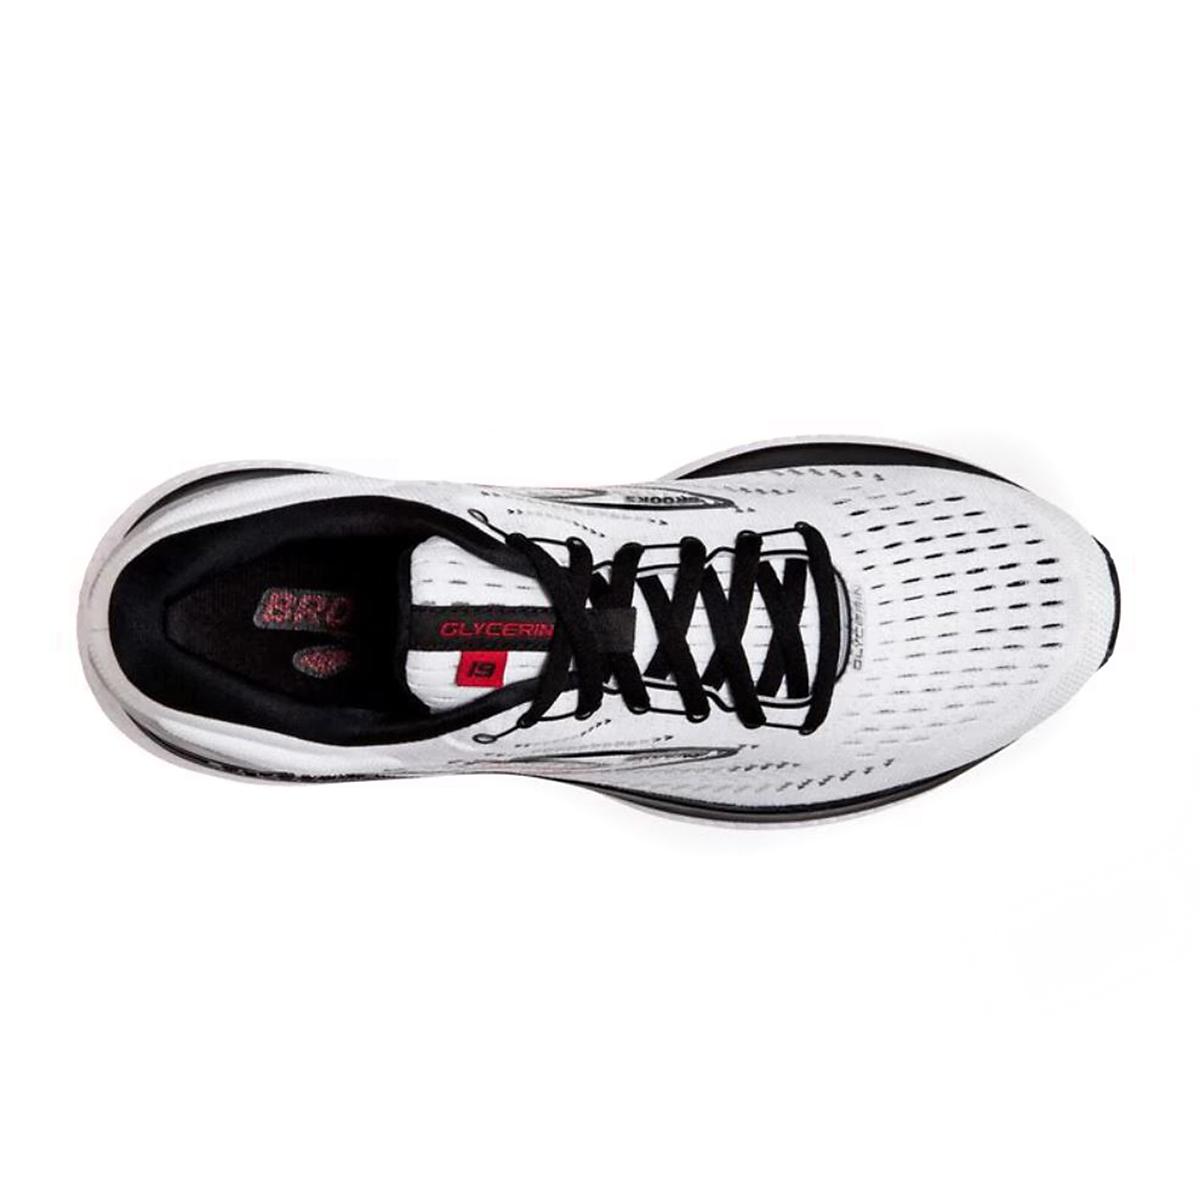 Men's Brooks Glycerin 19 Running Shoe - Color: White/Black/Red - Size: 7 - Width: Regular, White/Black/Red, large, image 5